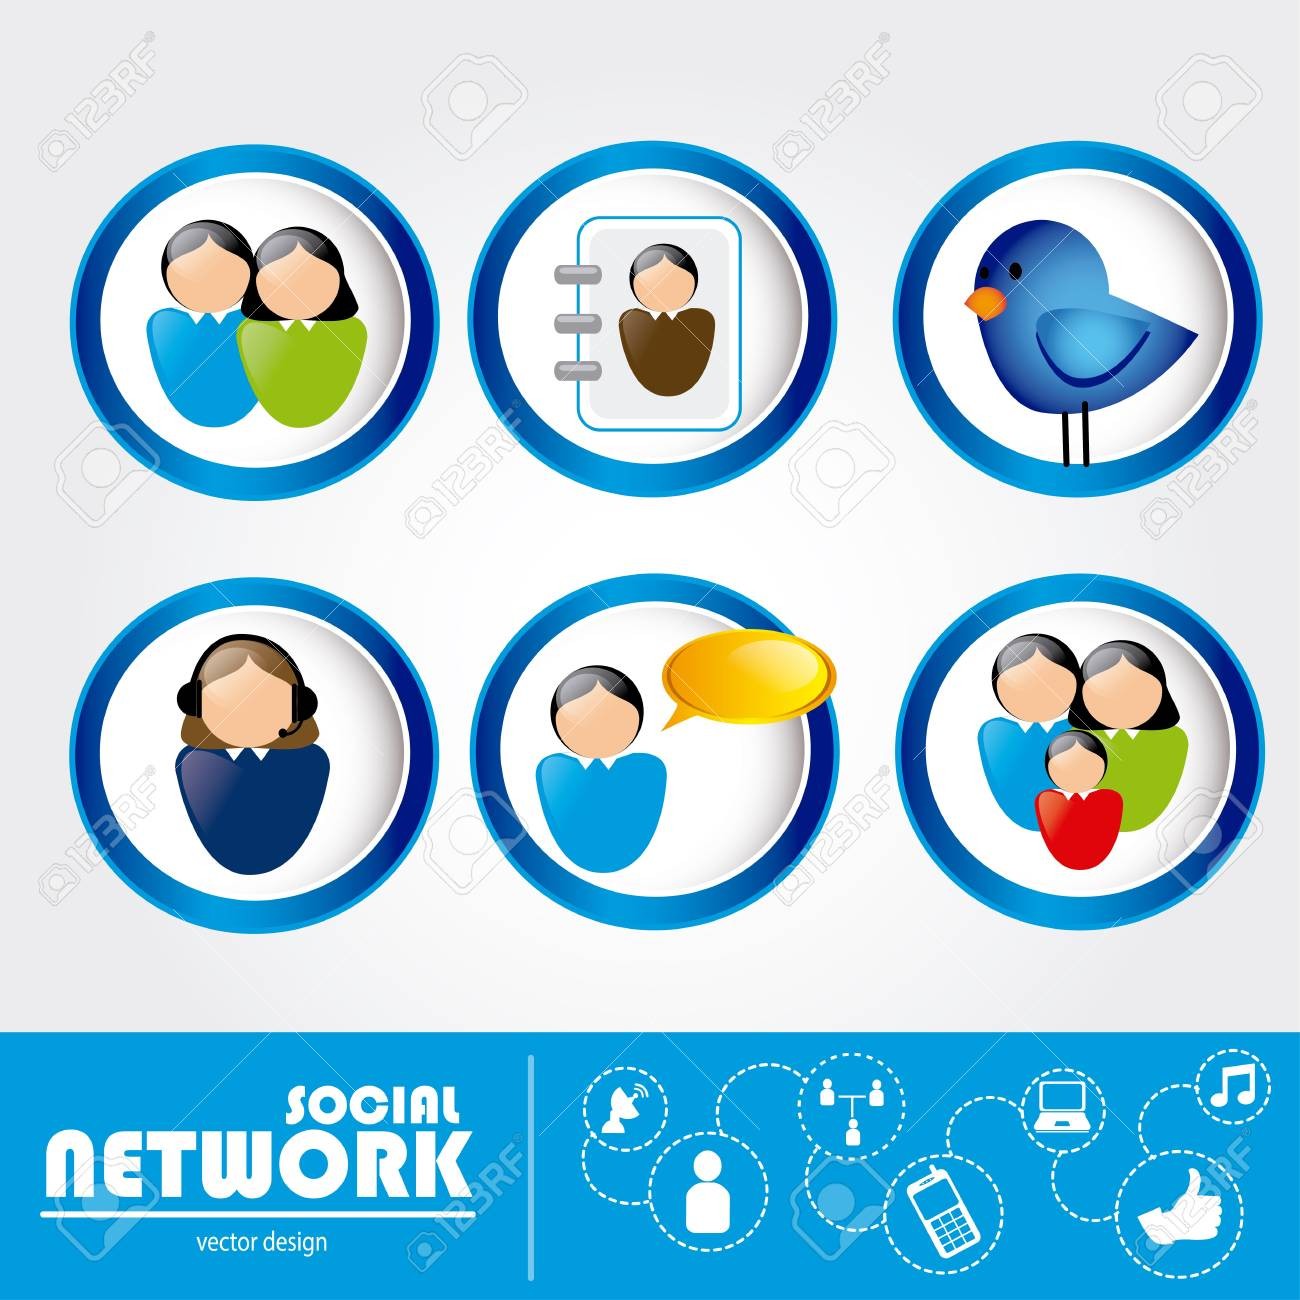 social networks over white background vector illustration Stock Vector - 19916438